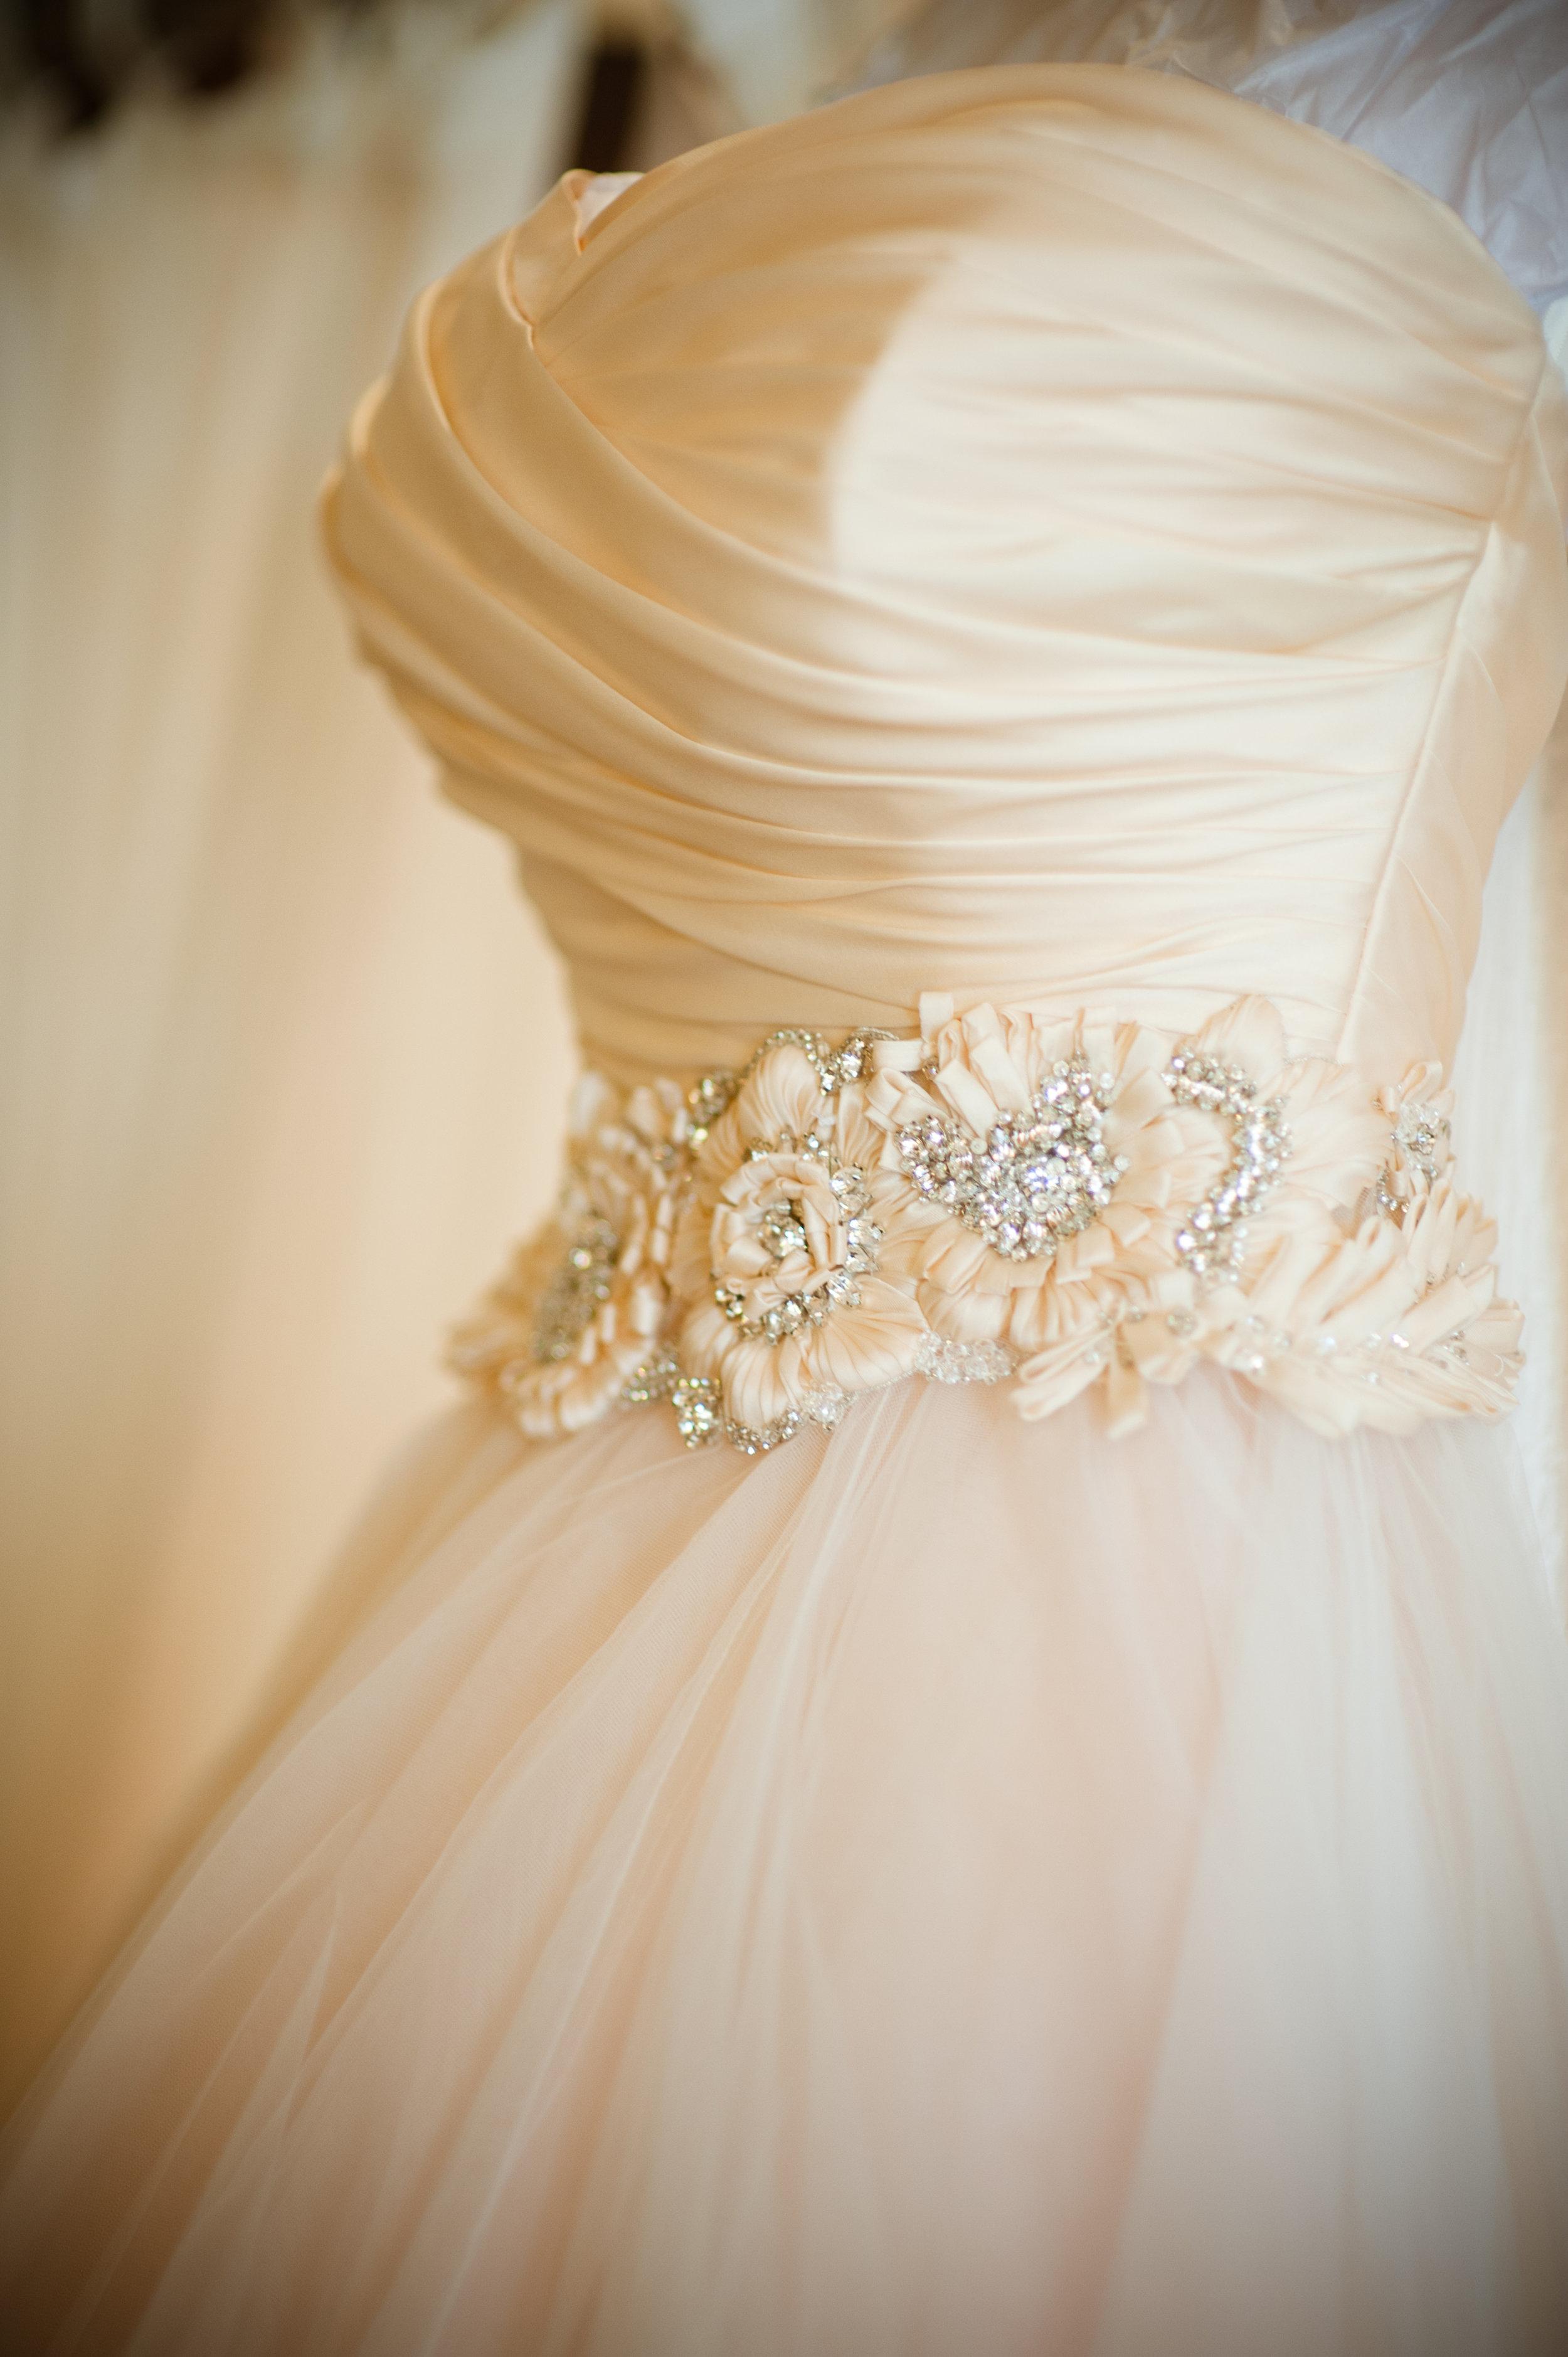 1 bridal gown elegant wedding dress white wedding dress detailed belt on wedding dress Christine Johnson Photography Life Design Events.jpg